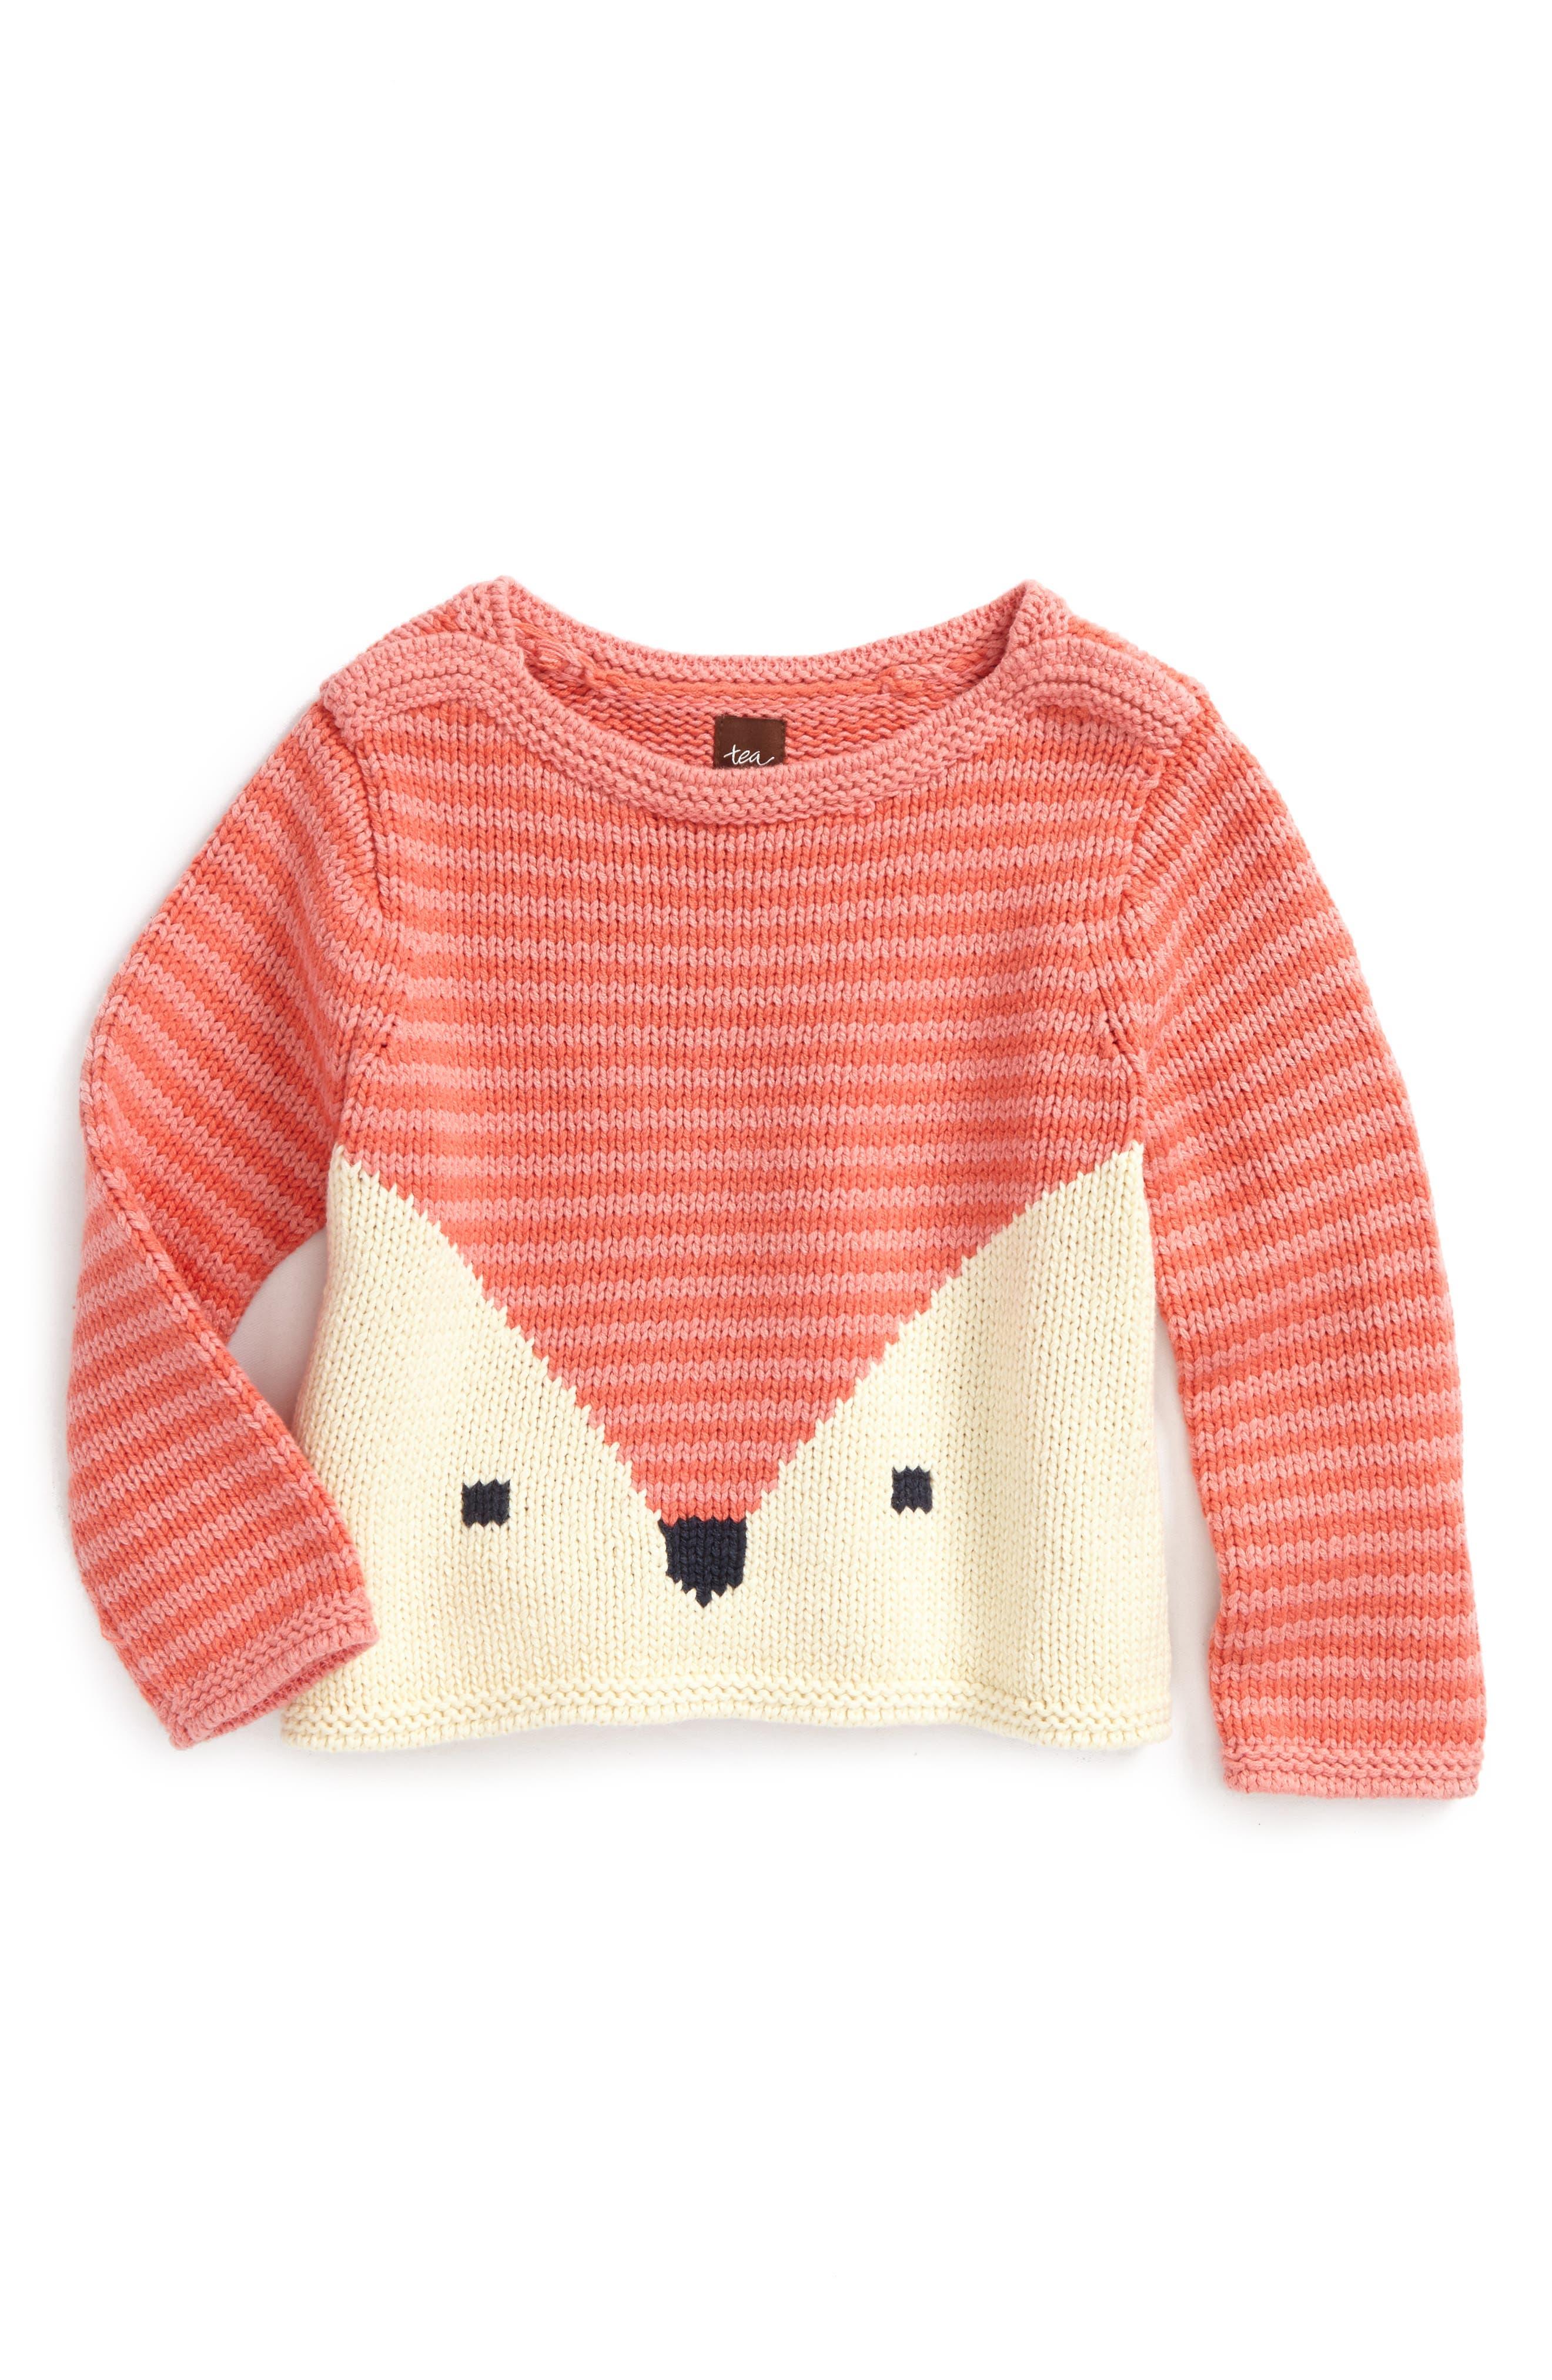 Fox Sweater,                             Main thumbnail 1, color,                             Sorbet